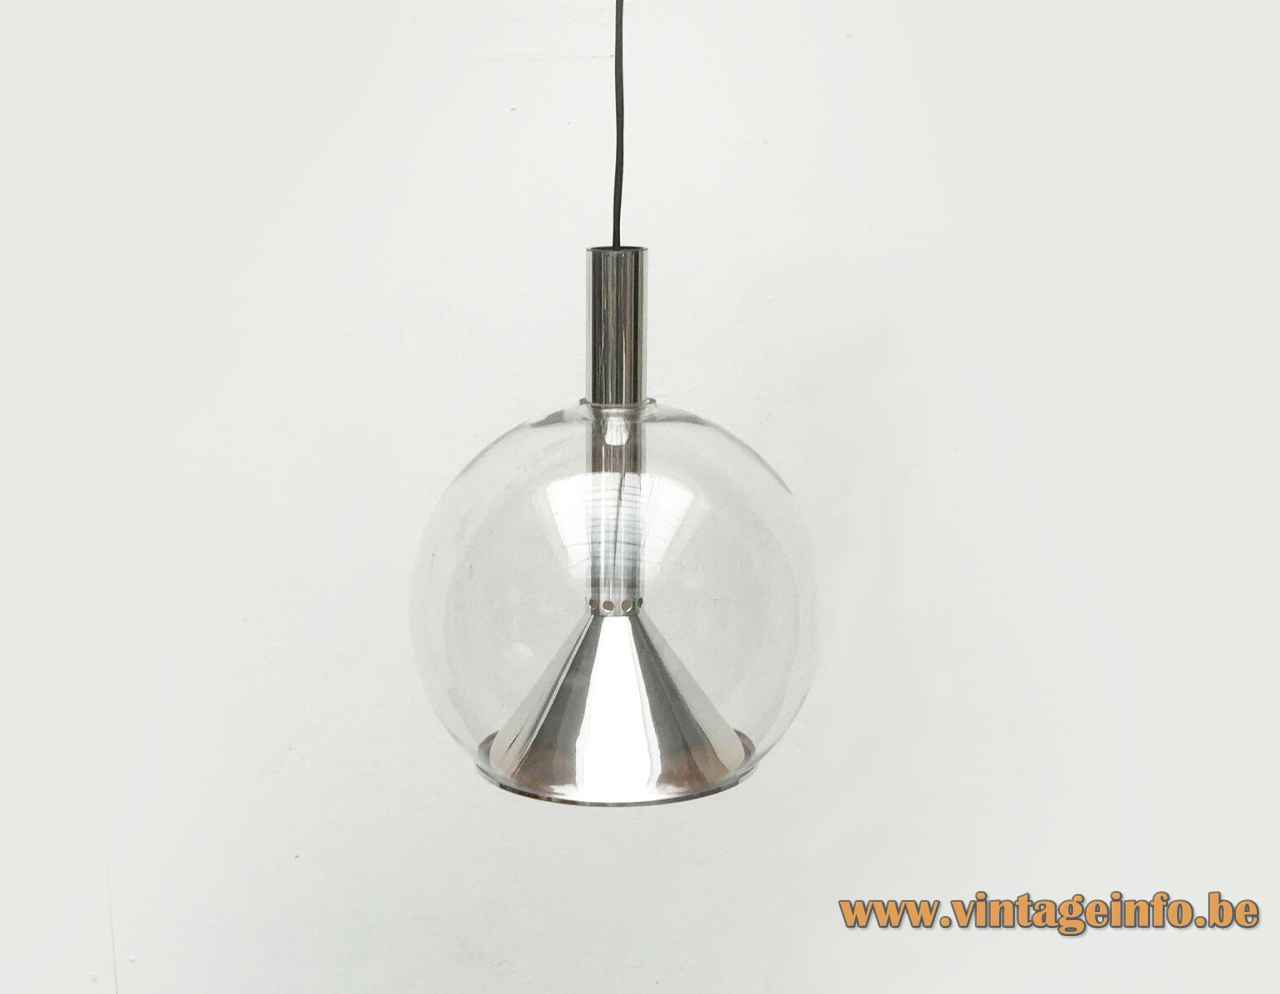 ERCO globe pendant lamp polished aluminium tube & diffuser clear glass lampshade 1970s Germany E27 socket